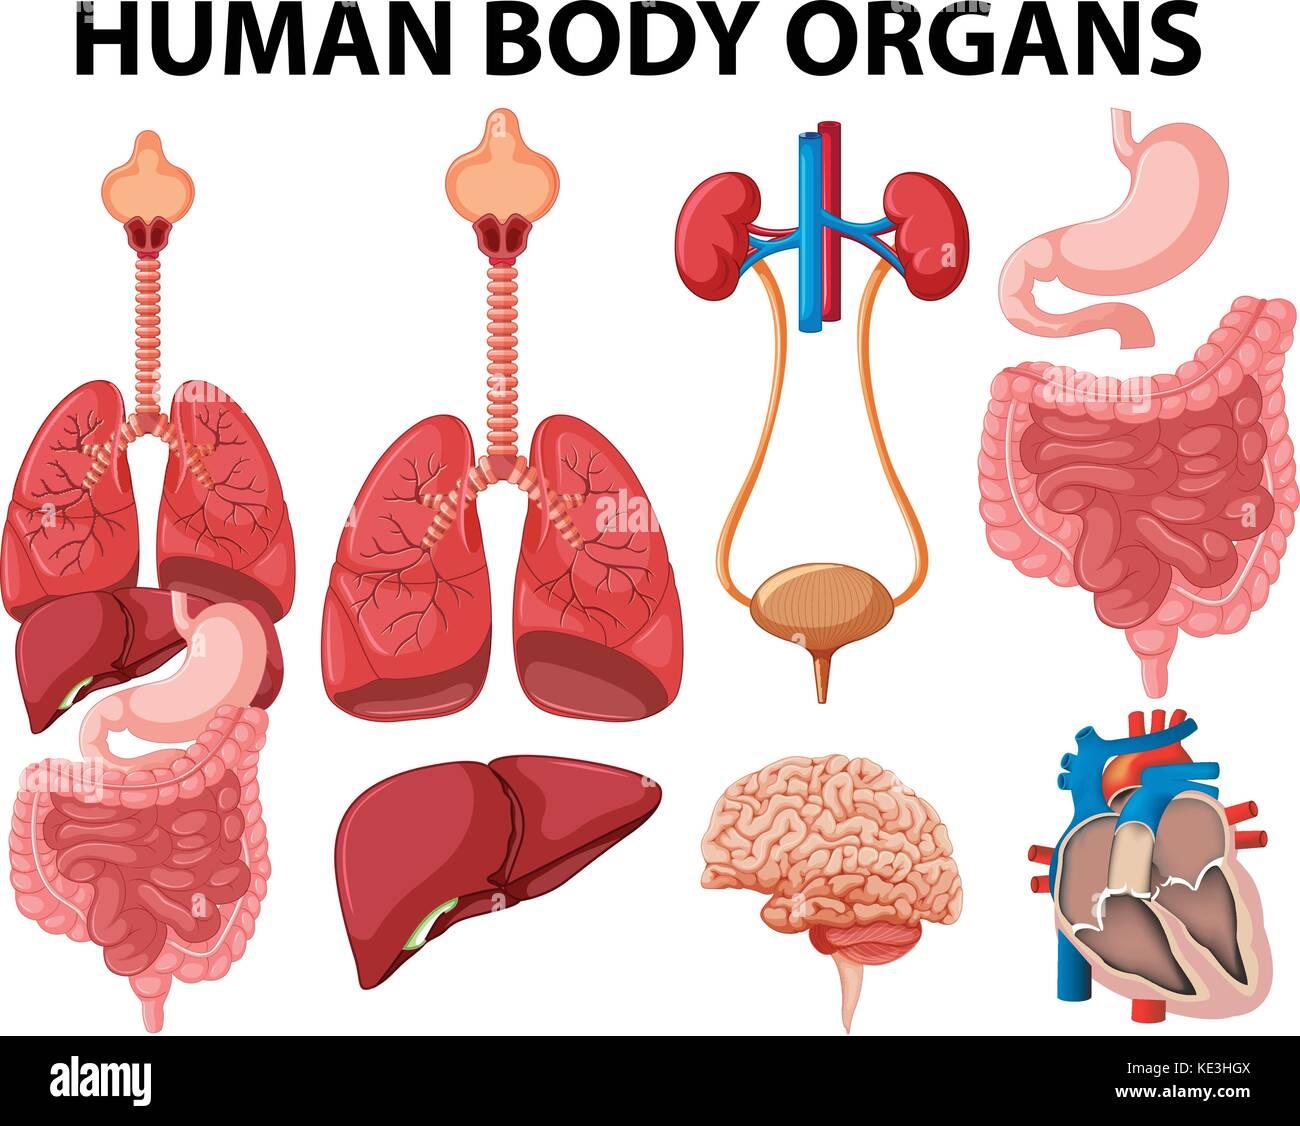 Different type of human body organs illustration Stock Vector Art ...